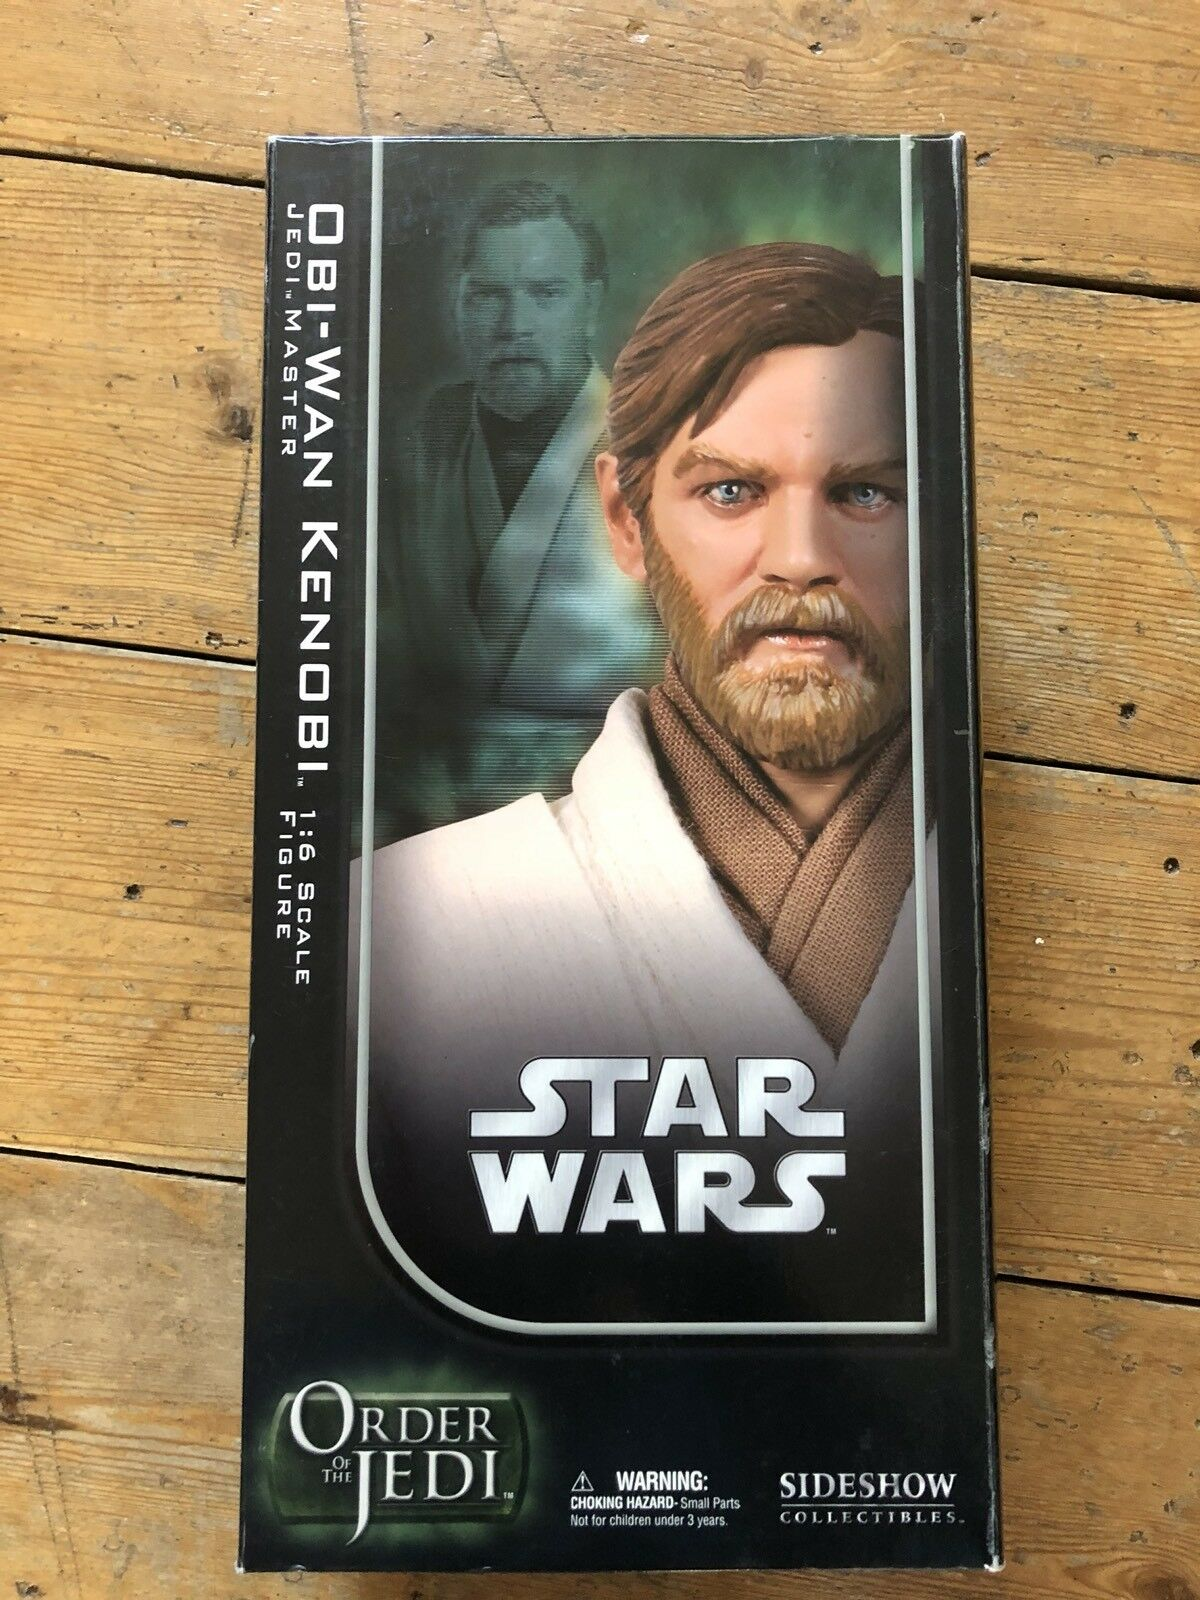 Sideshow Star Wars ordine dei Jedi Obi Wan Kenobi Jedi Master afssc 1033